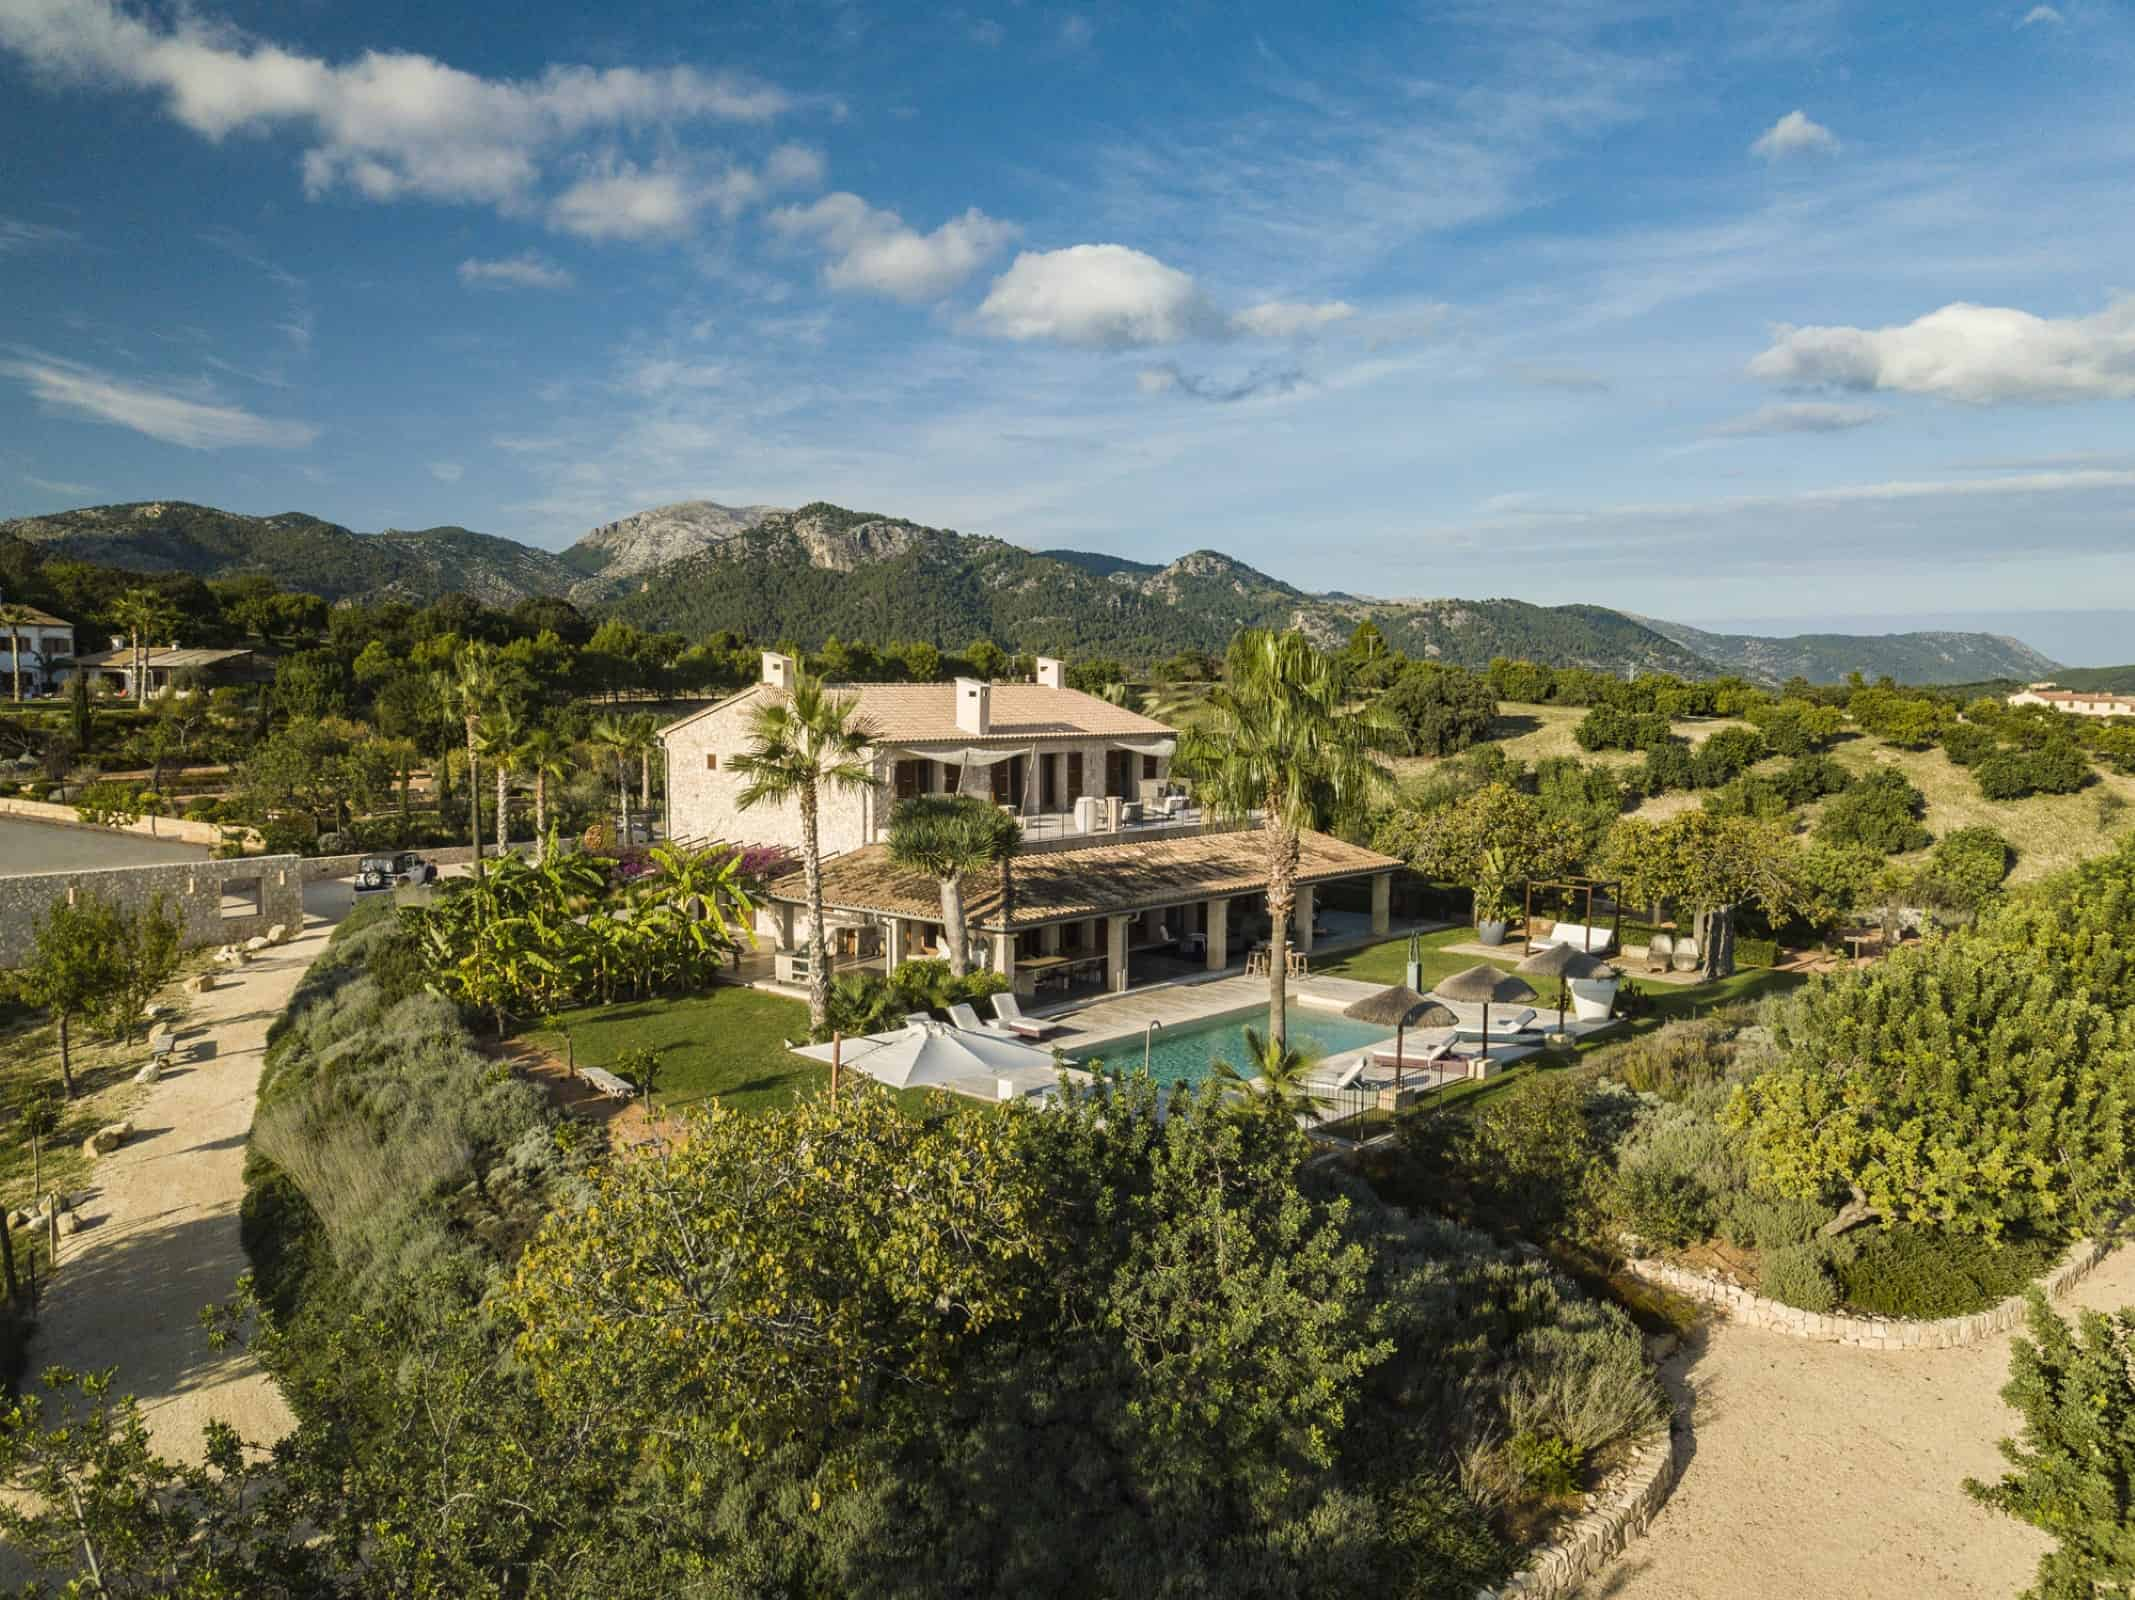 Villa Rental in Mallorca - 5 Bedrooms - Balearic Bliss - Can Vi Baix - Moscari - aerial view